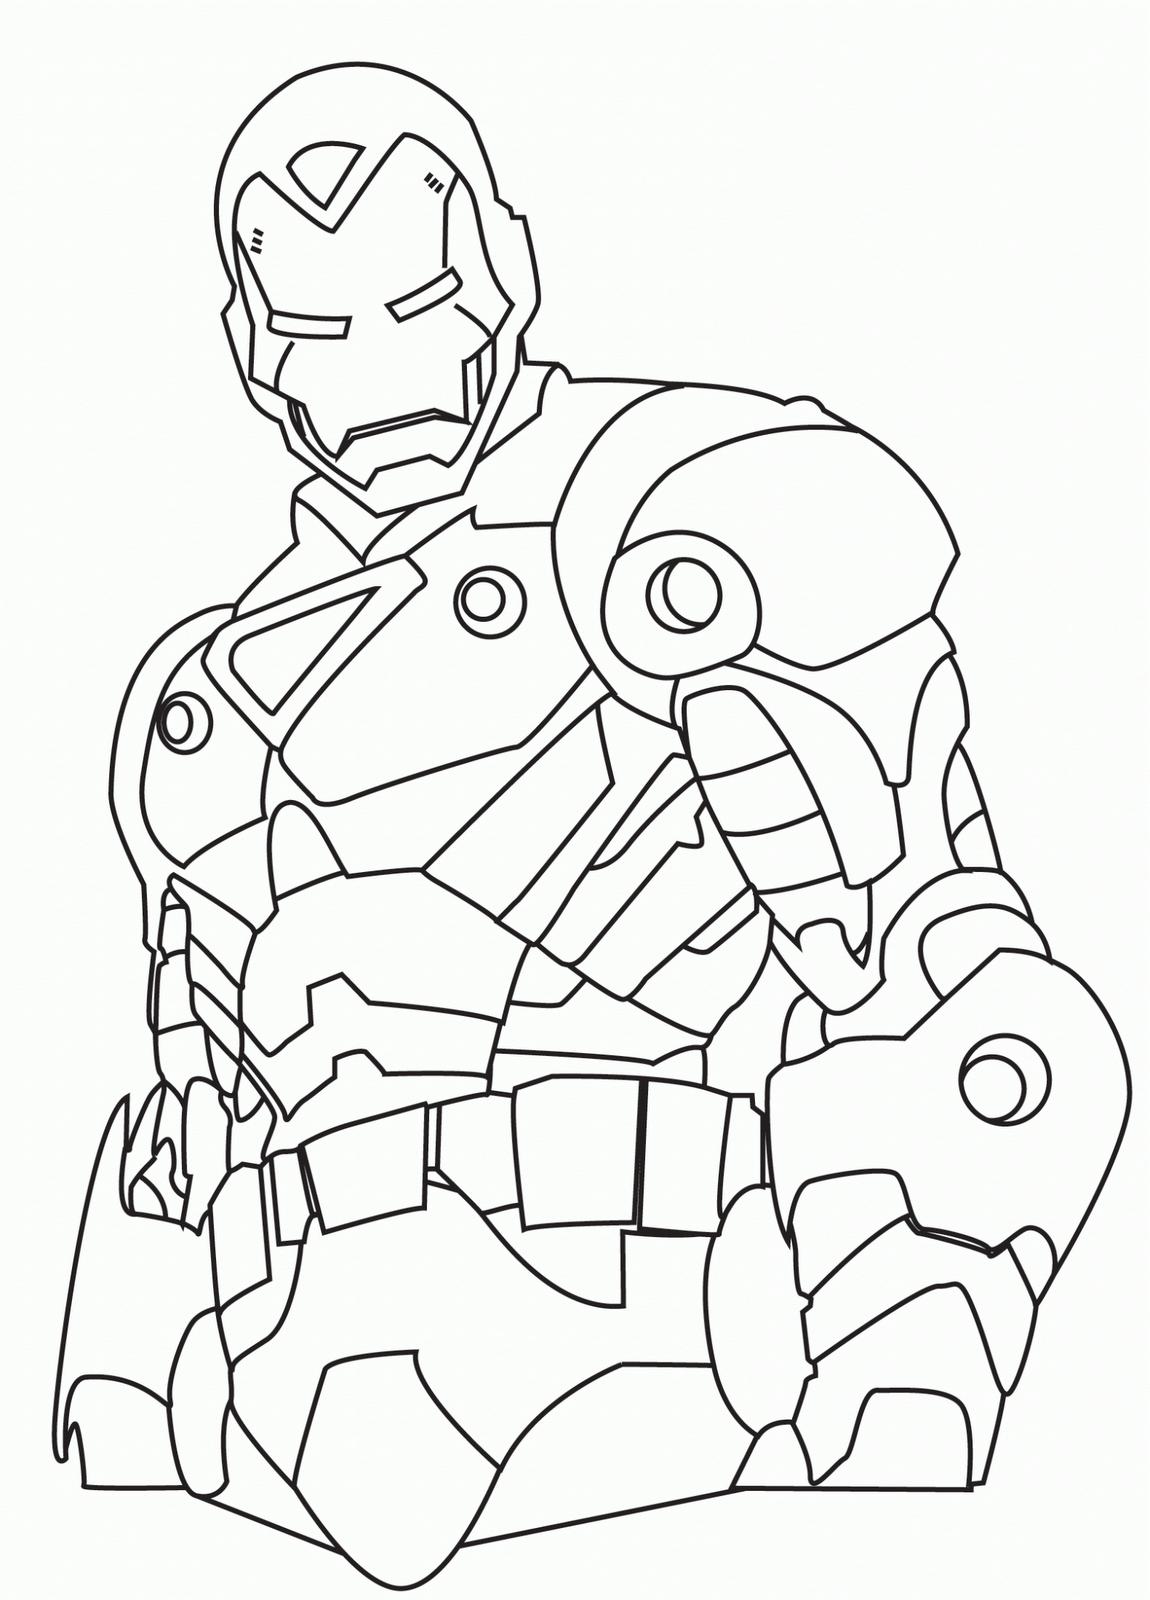 Uncategorized Iron Man 2 Coloring Pages colorear iron man 2 5 dibujos infantiles png pixels marvel superhero ironman coloring page